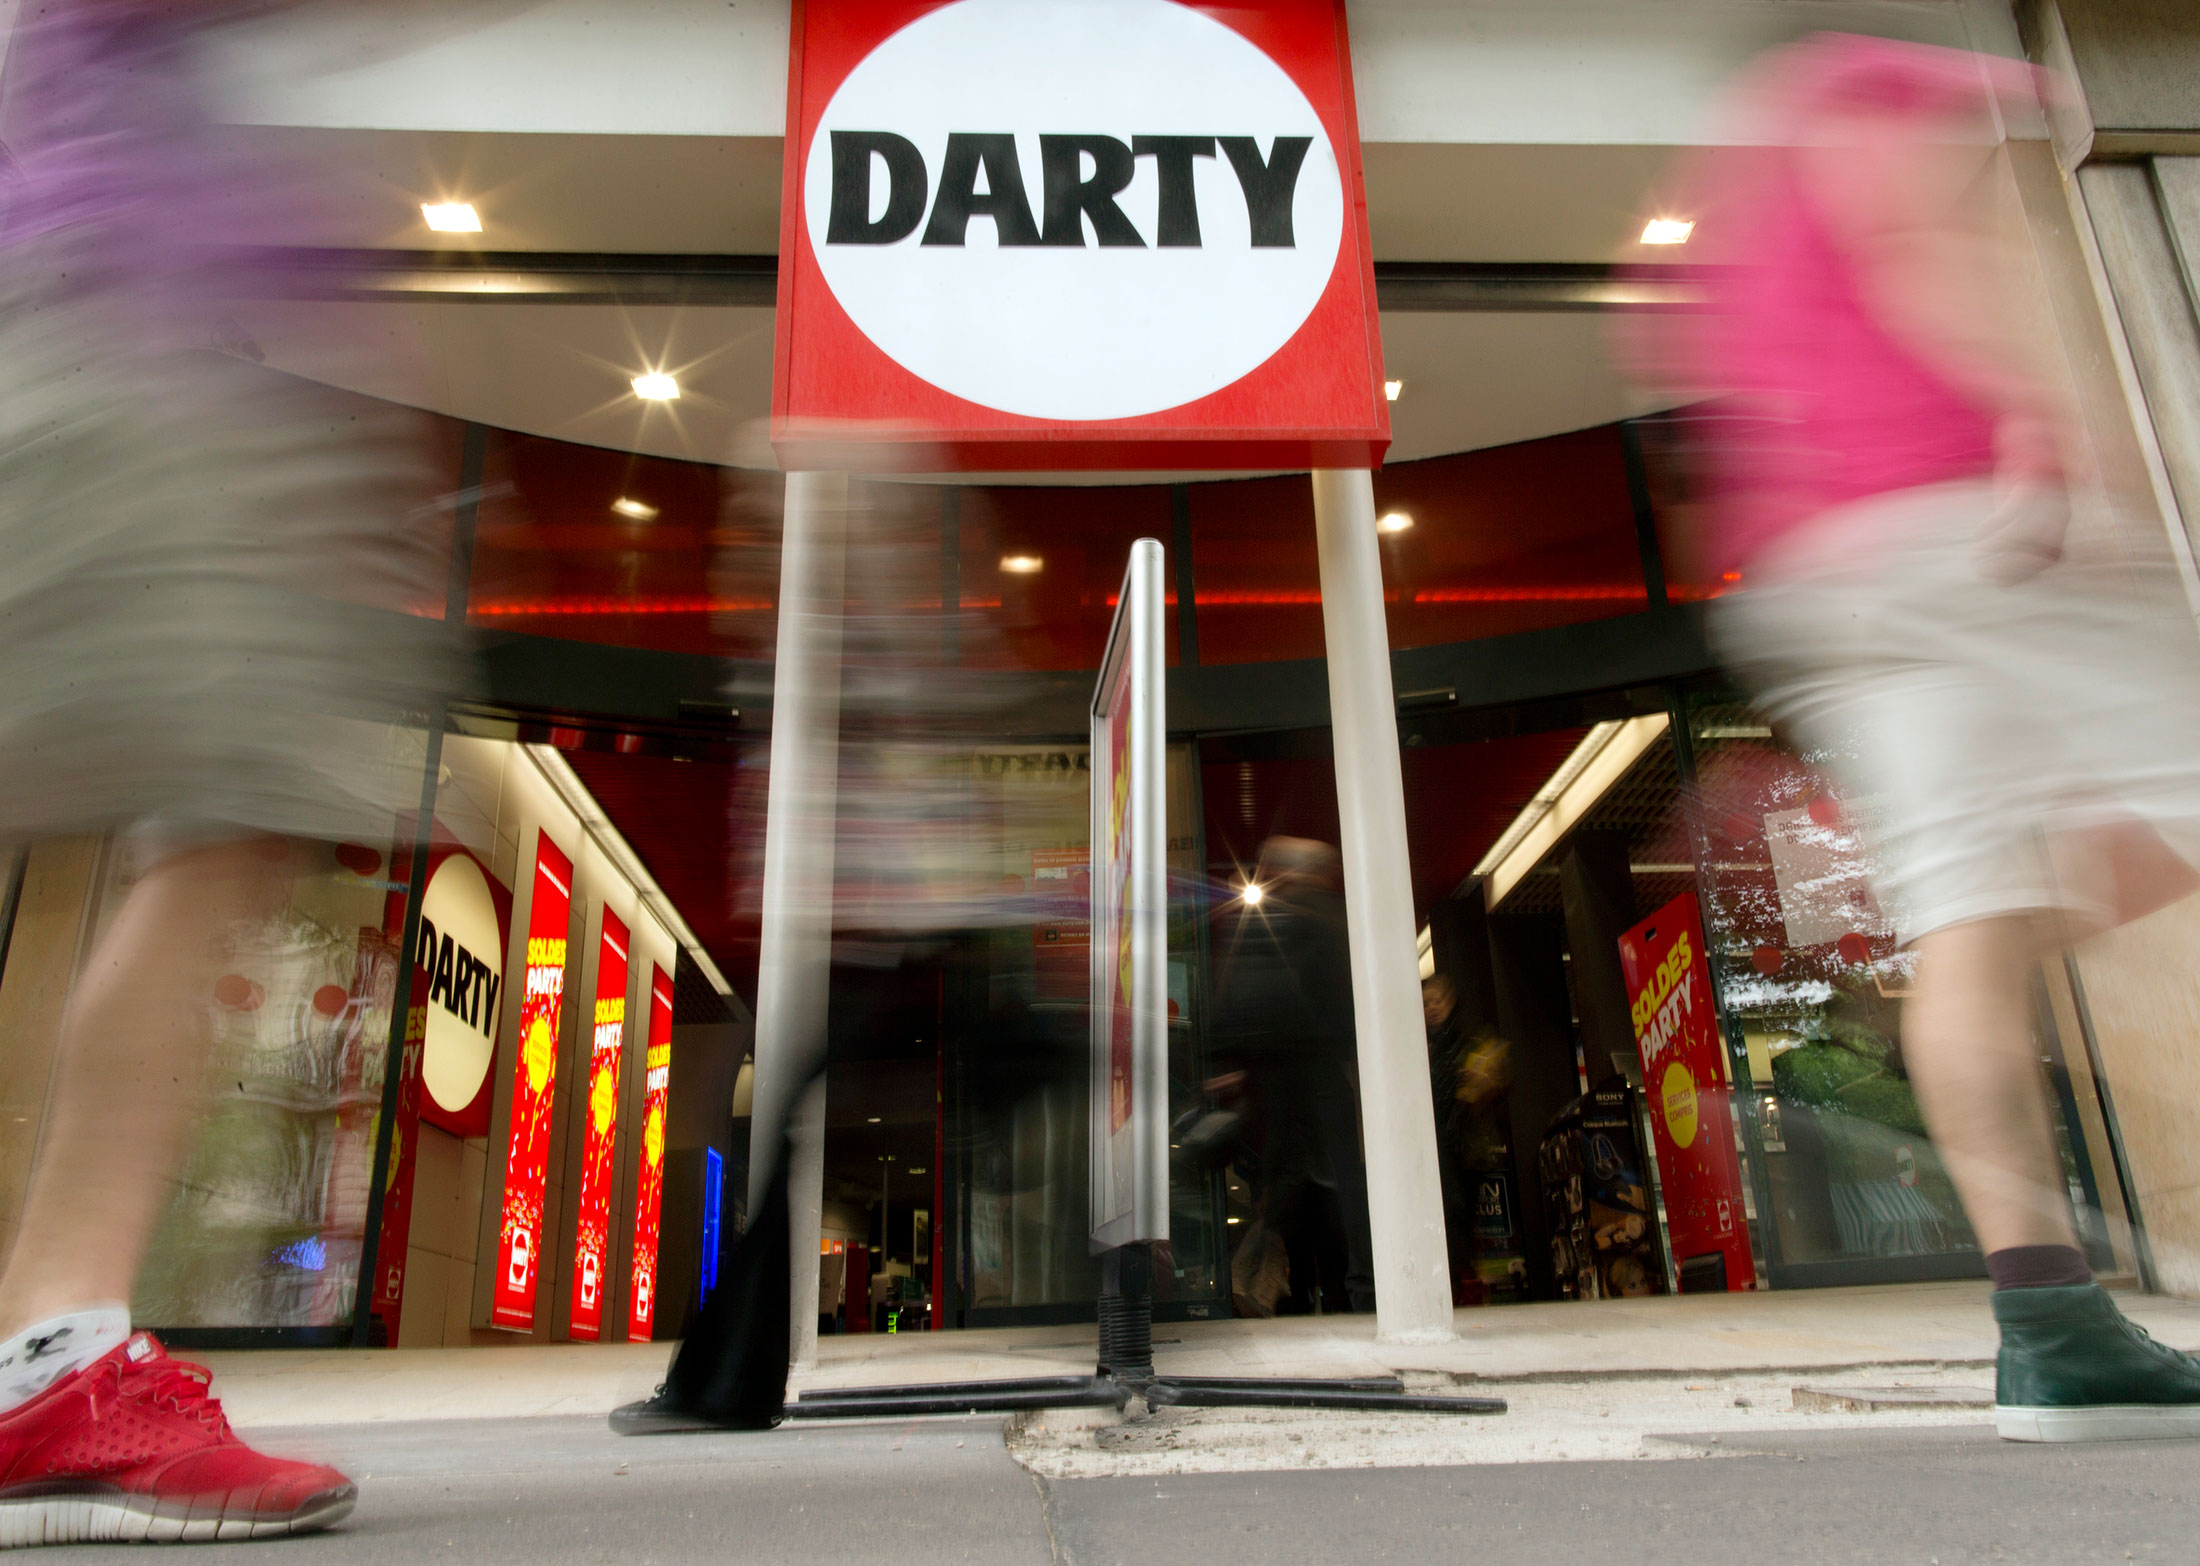 Radio Salle De Bain Darty ~ dartydarty fnac darty bourse ventes cuisine darty nova darty